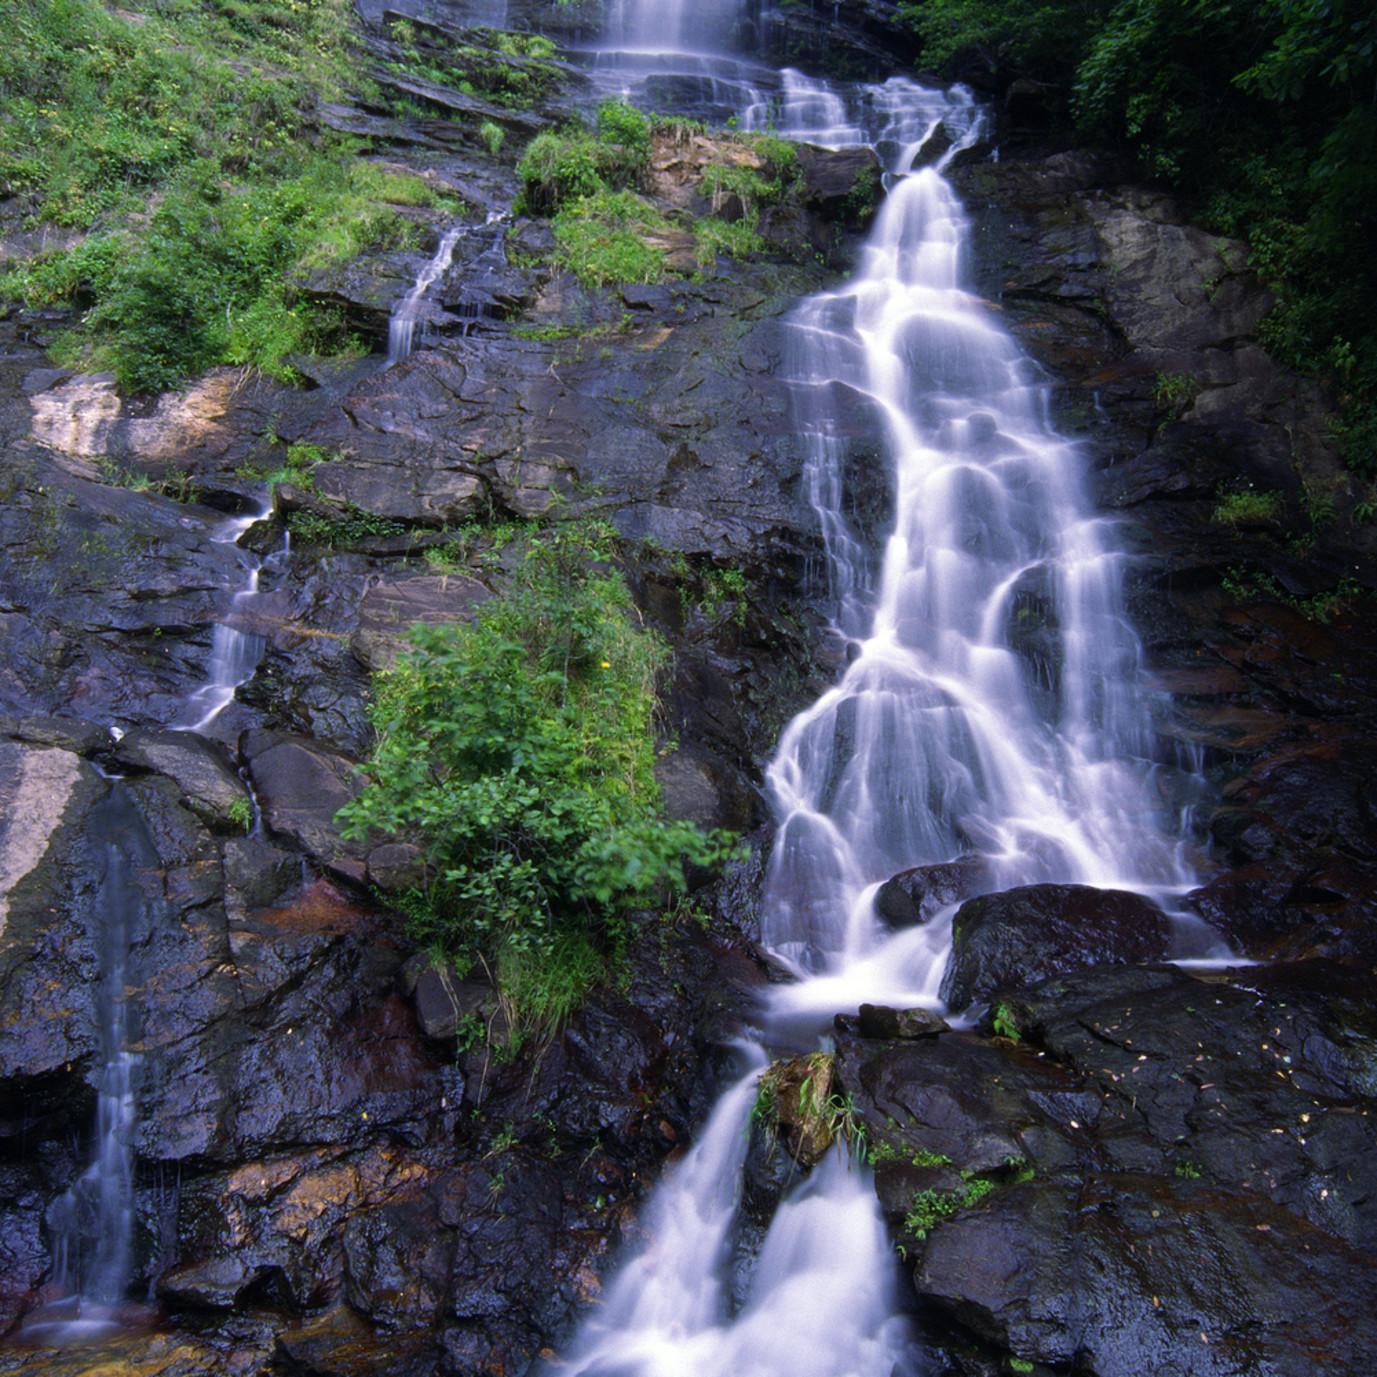 Amicalola falls ouigyb